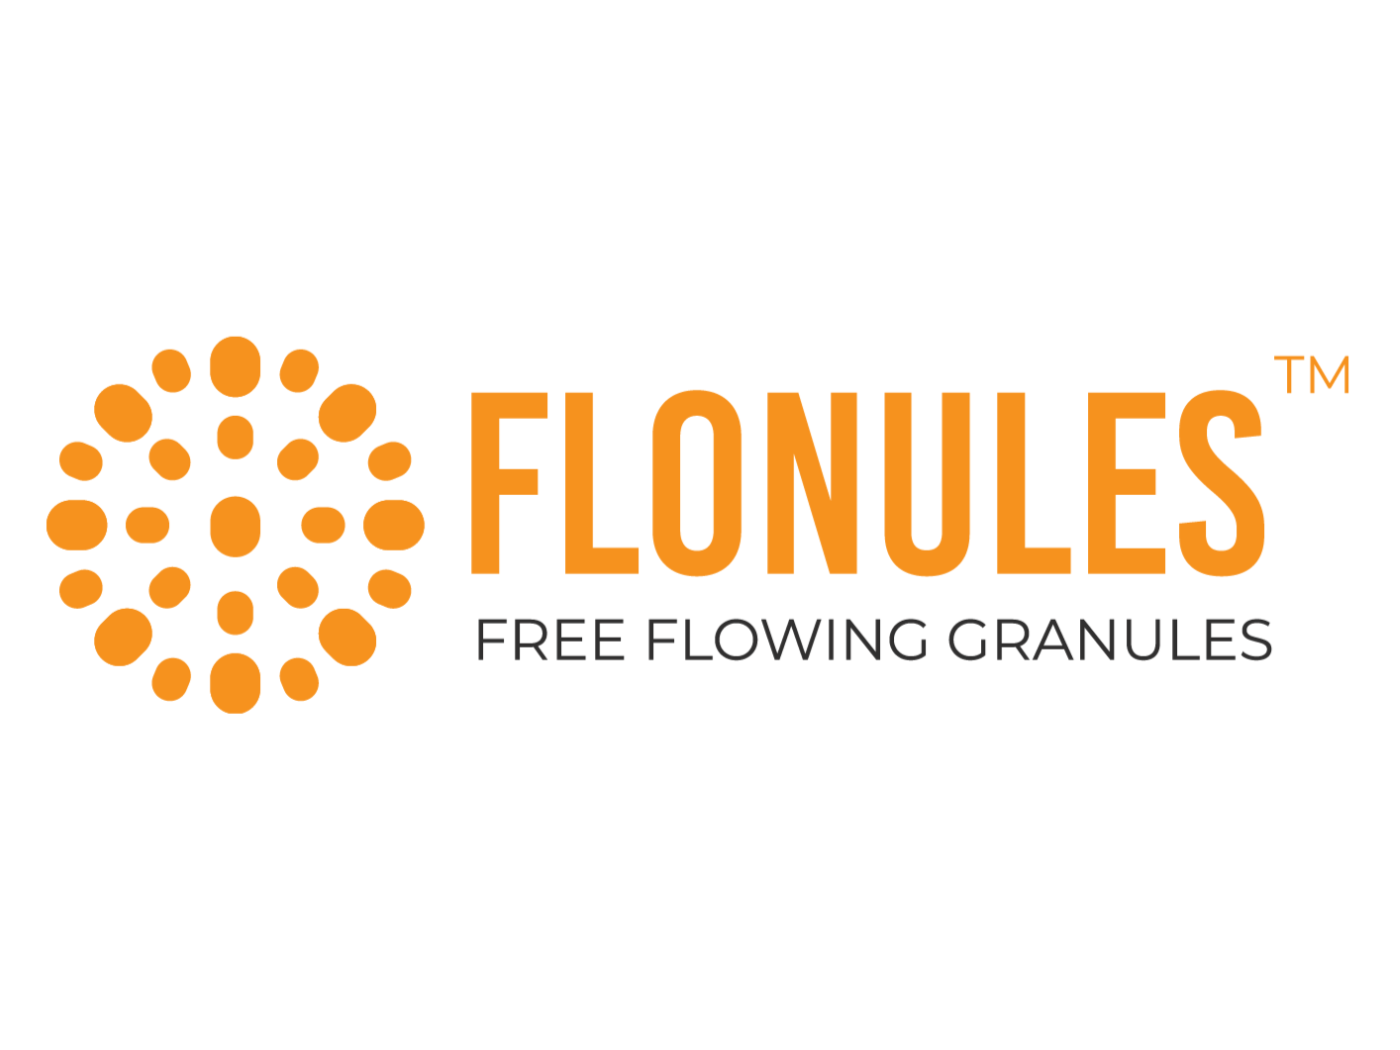 Flonules™ Boswellia Serrata Dry Extract Granules 80%